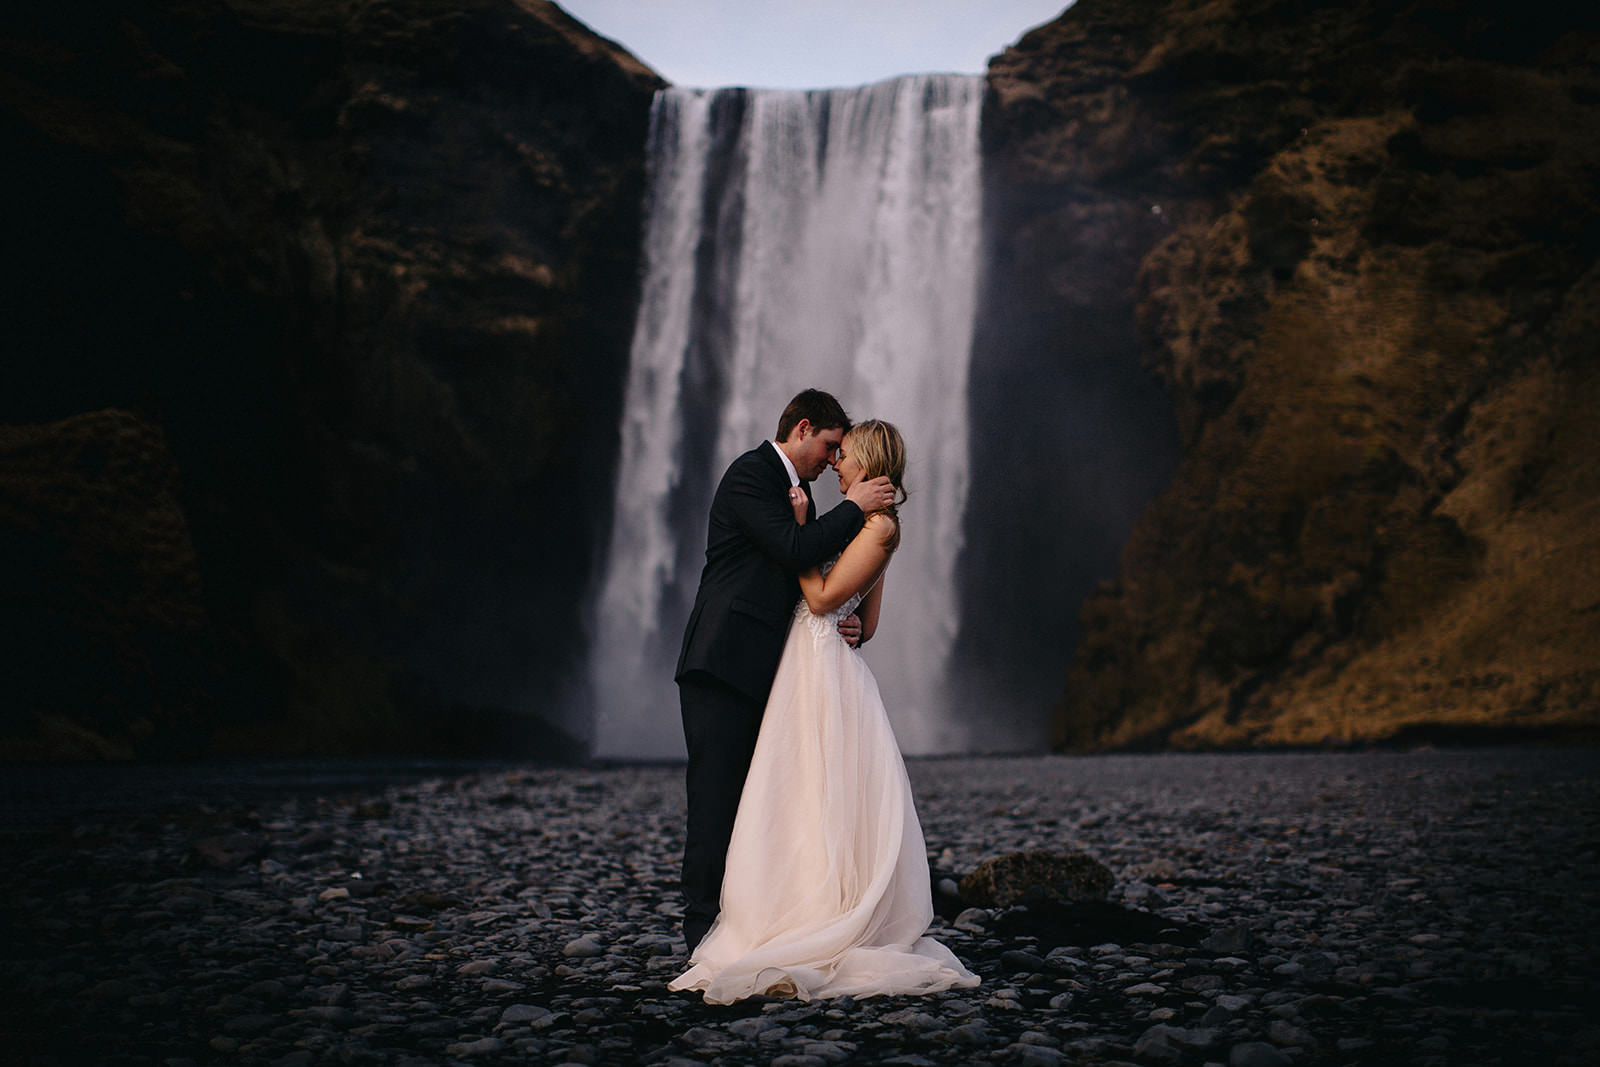 Icelandic Iceland Elopement Wedding Elope Photographer Eloping Reykjavík Vik Black Sand Beach Jökulsárlón Skogafoss Waterfall Vestrahorn Mountain Liz Osban Photography Destination 96.jpg